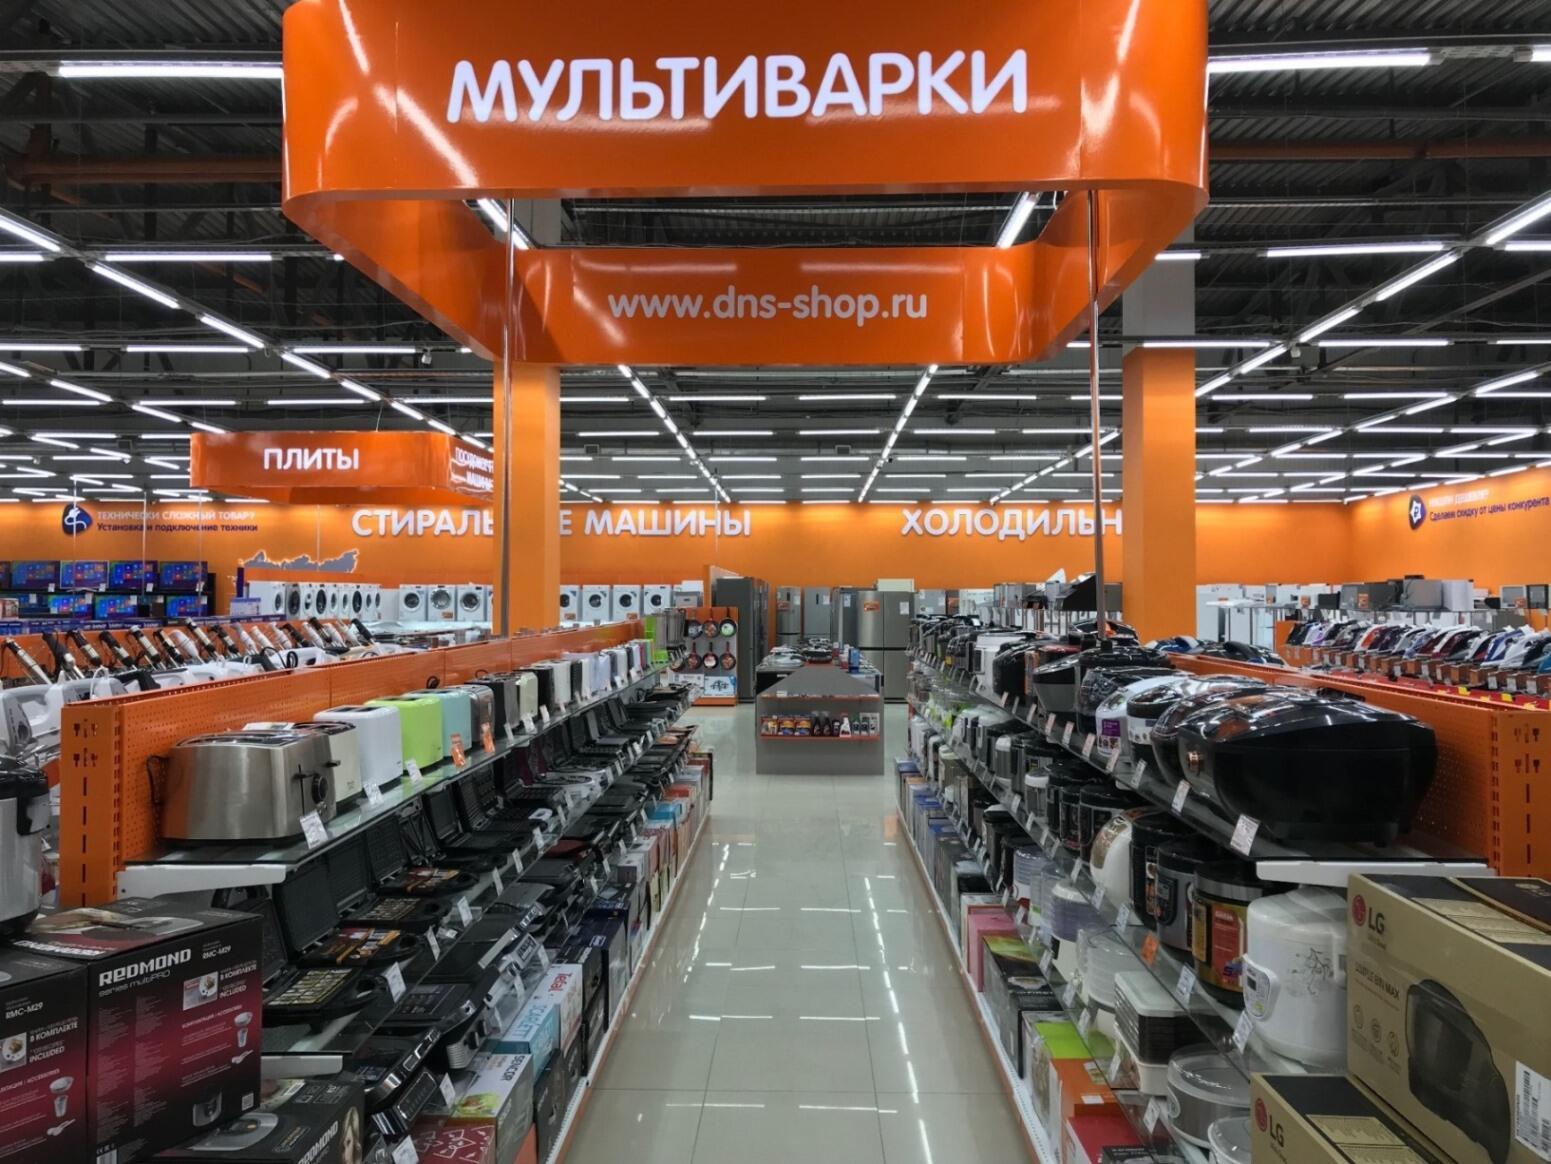 db9c9594c77d Иркутск – магазин DNS ТЦ «Мега Хоум» : адрес, телефон, часы работы ...